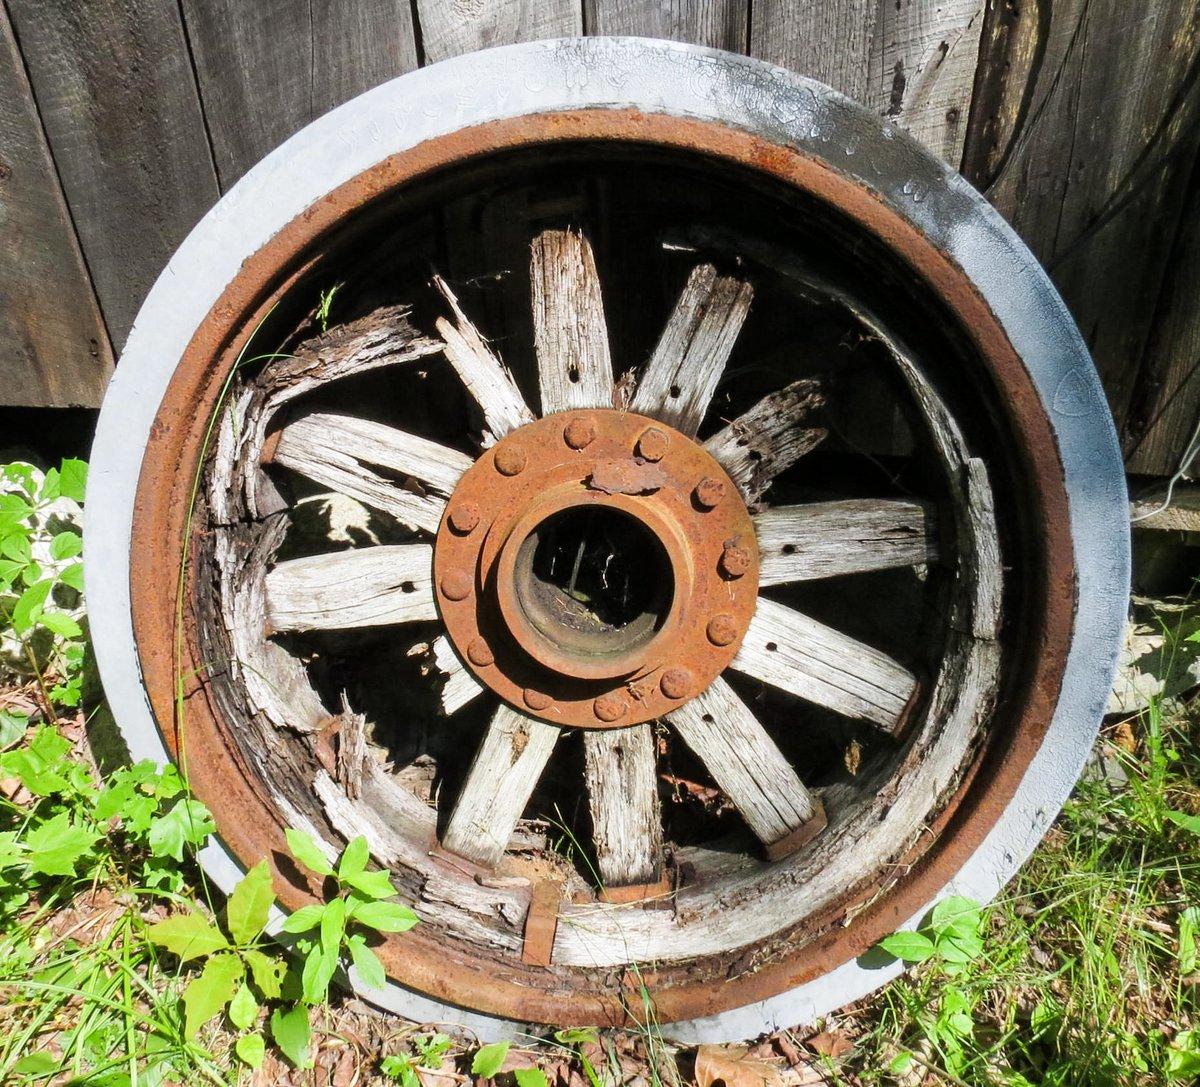 7. Old Wheel